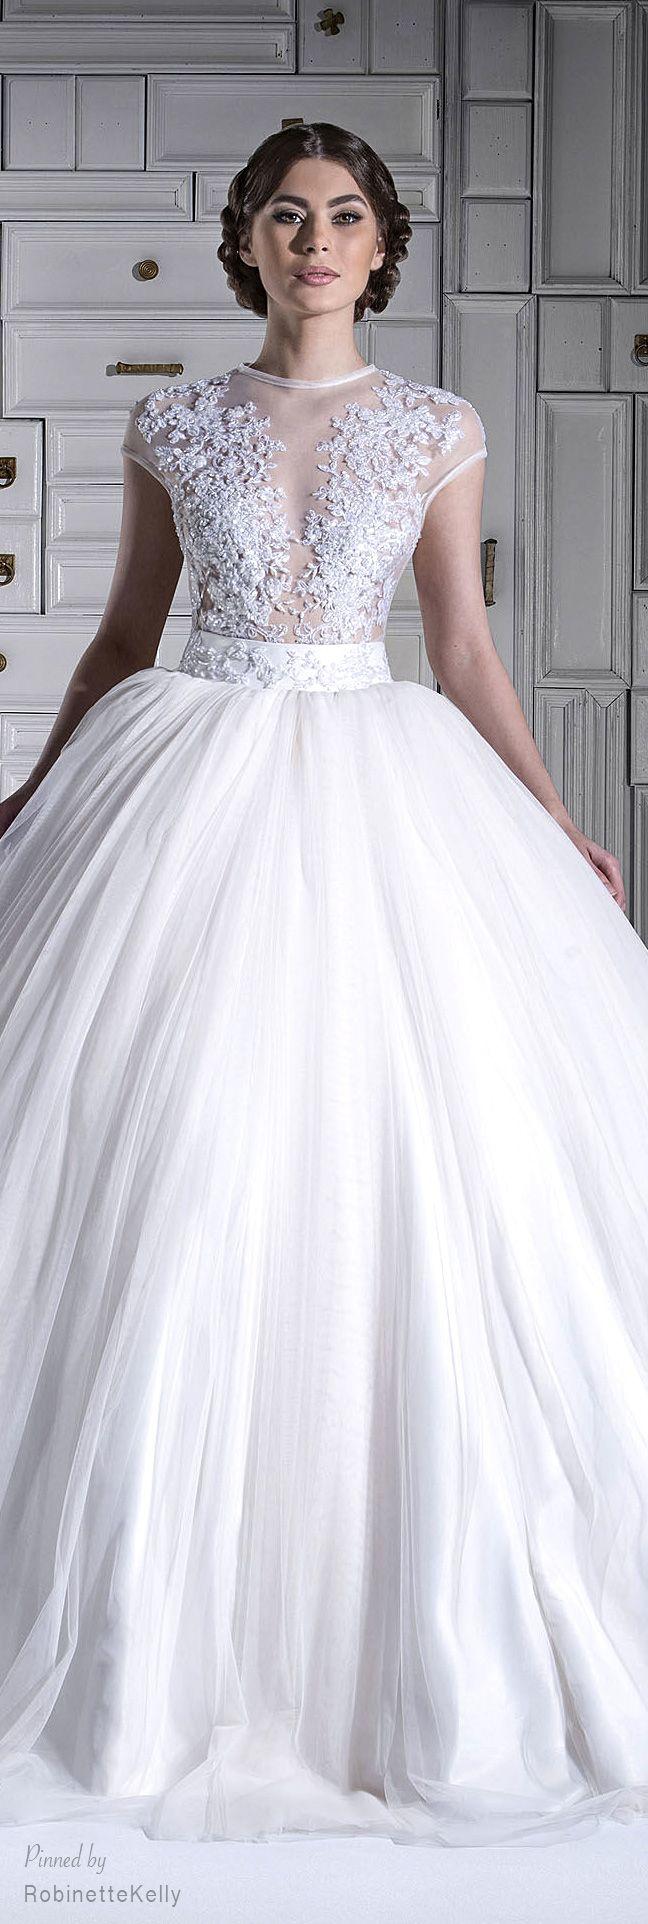 best wedding dresses images on pinterest groom attire wedding